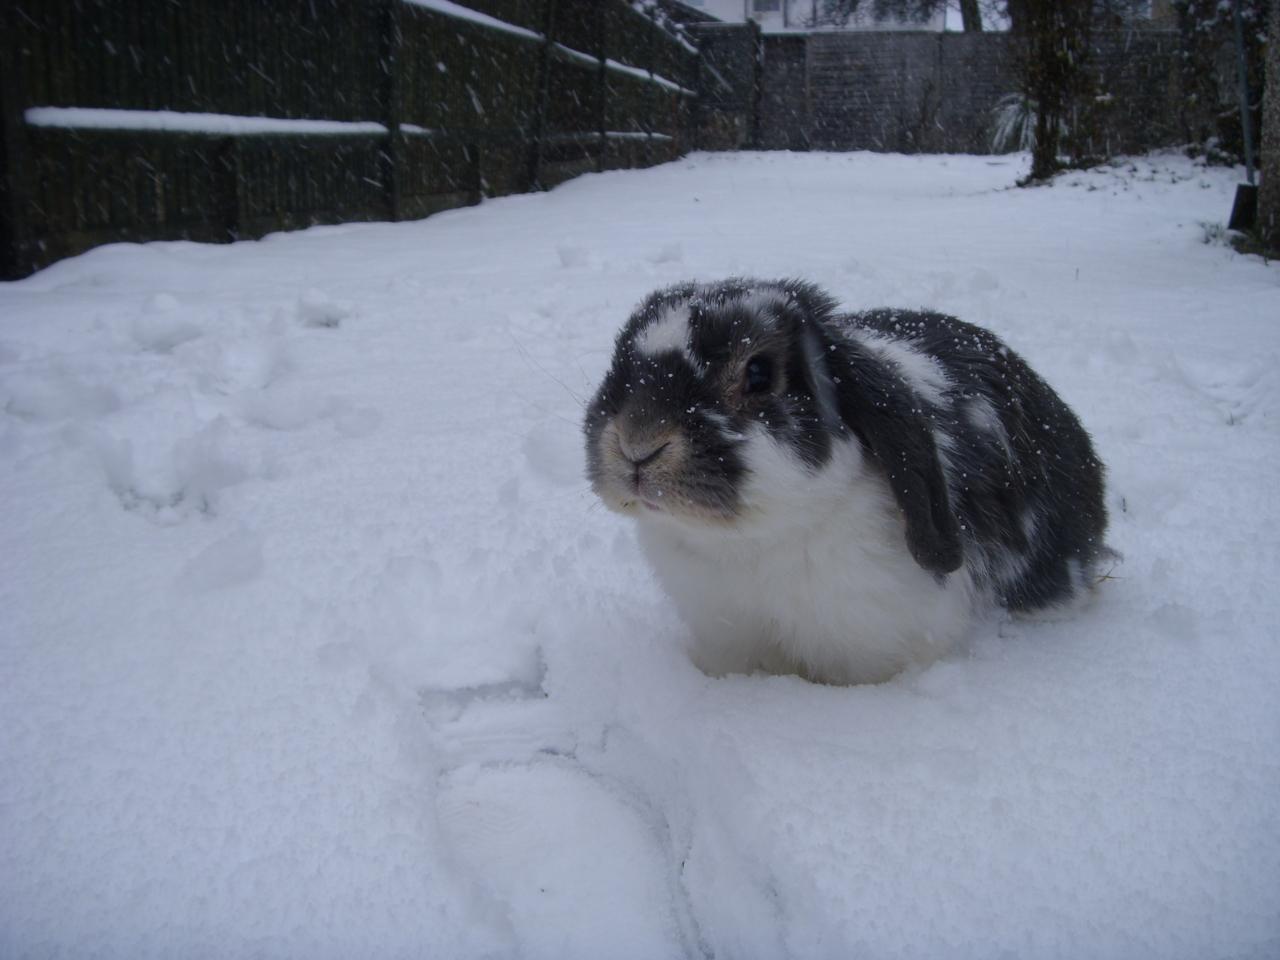 It's Snowing on Bunny